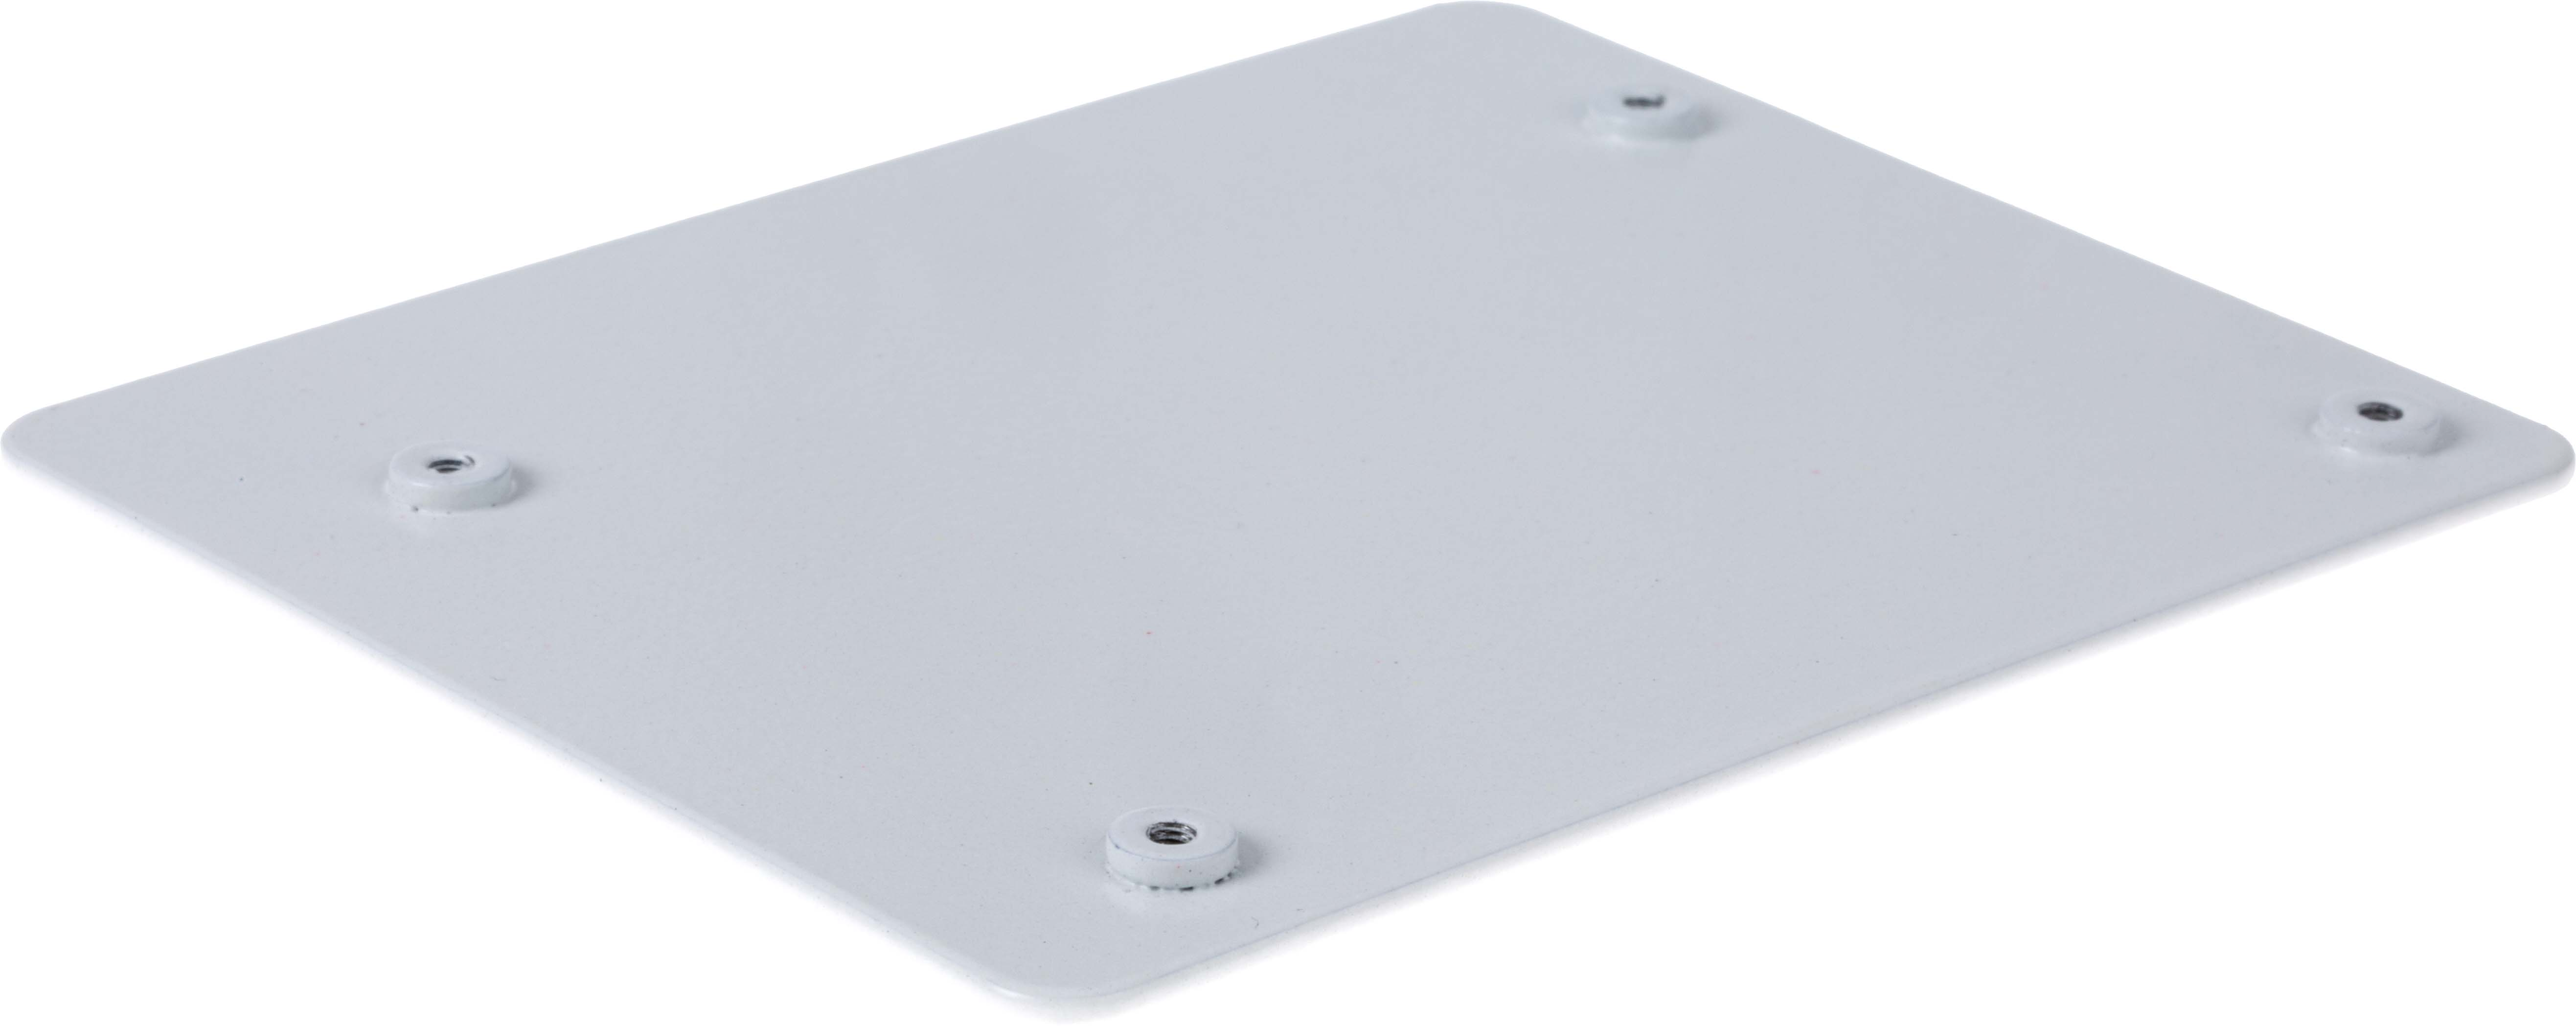 Jetson Nano support plate kit